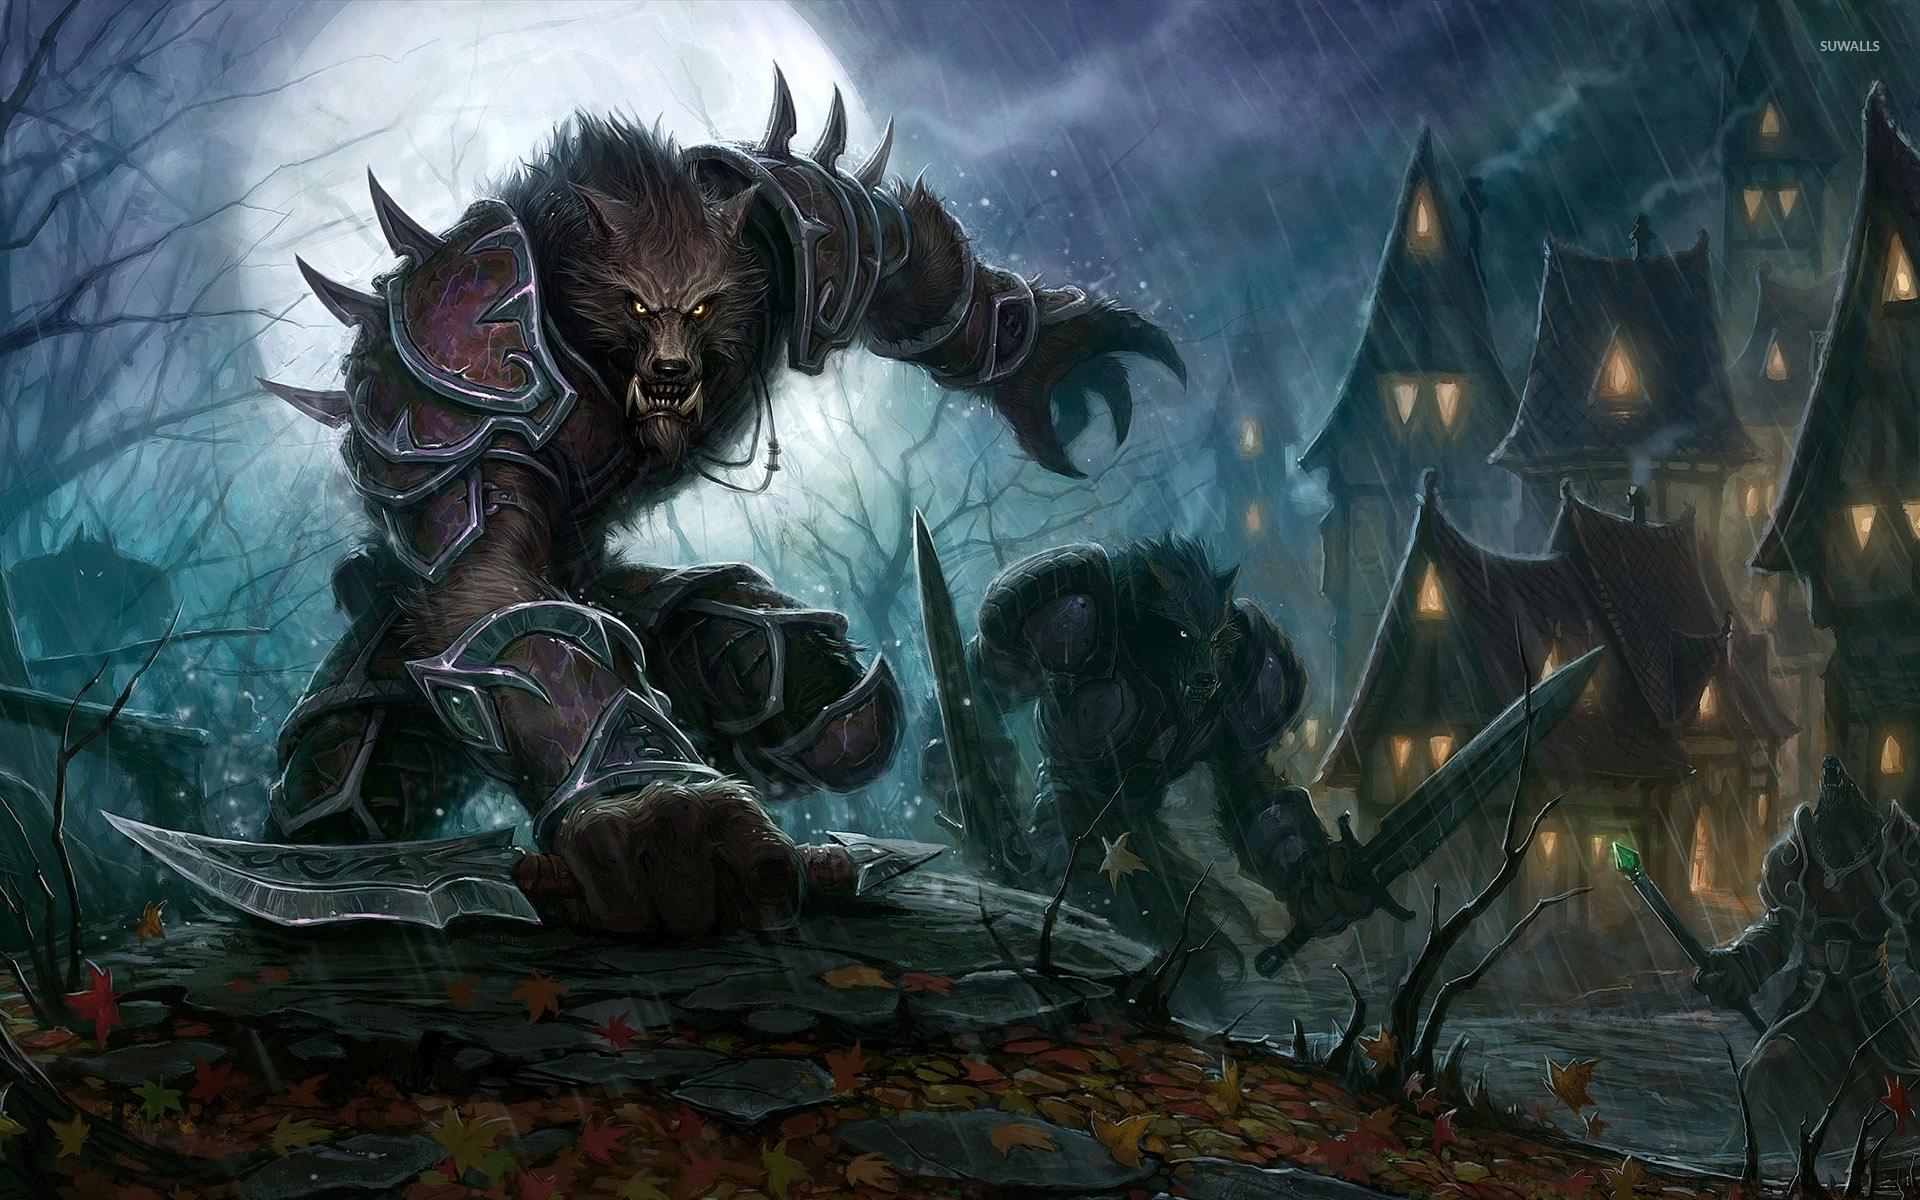 World Of Warcraft Cataclysm 9 Wallpaper Game Wallpapers 35239